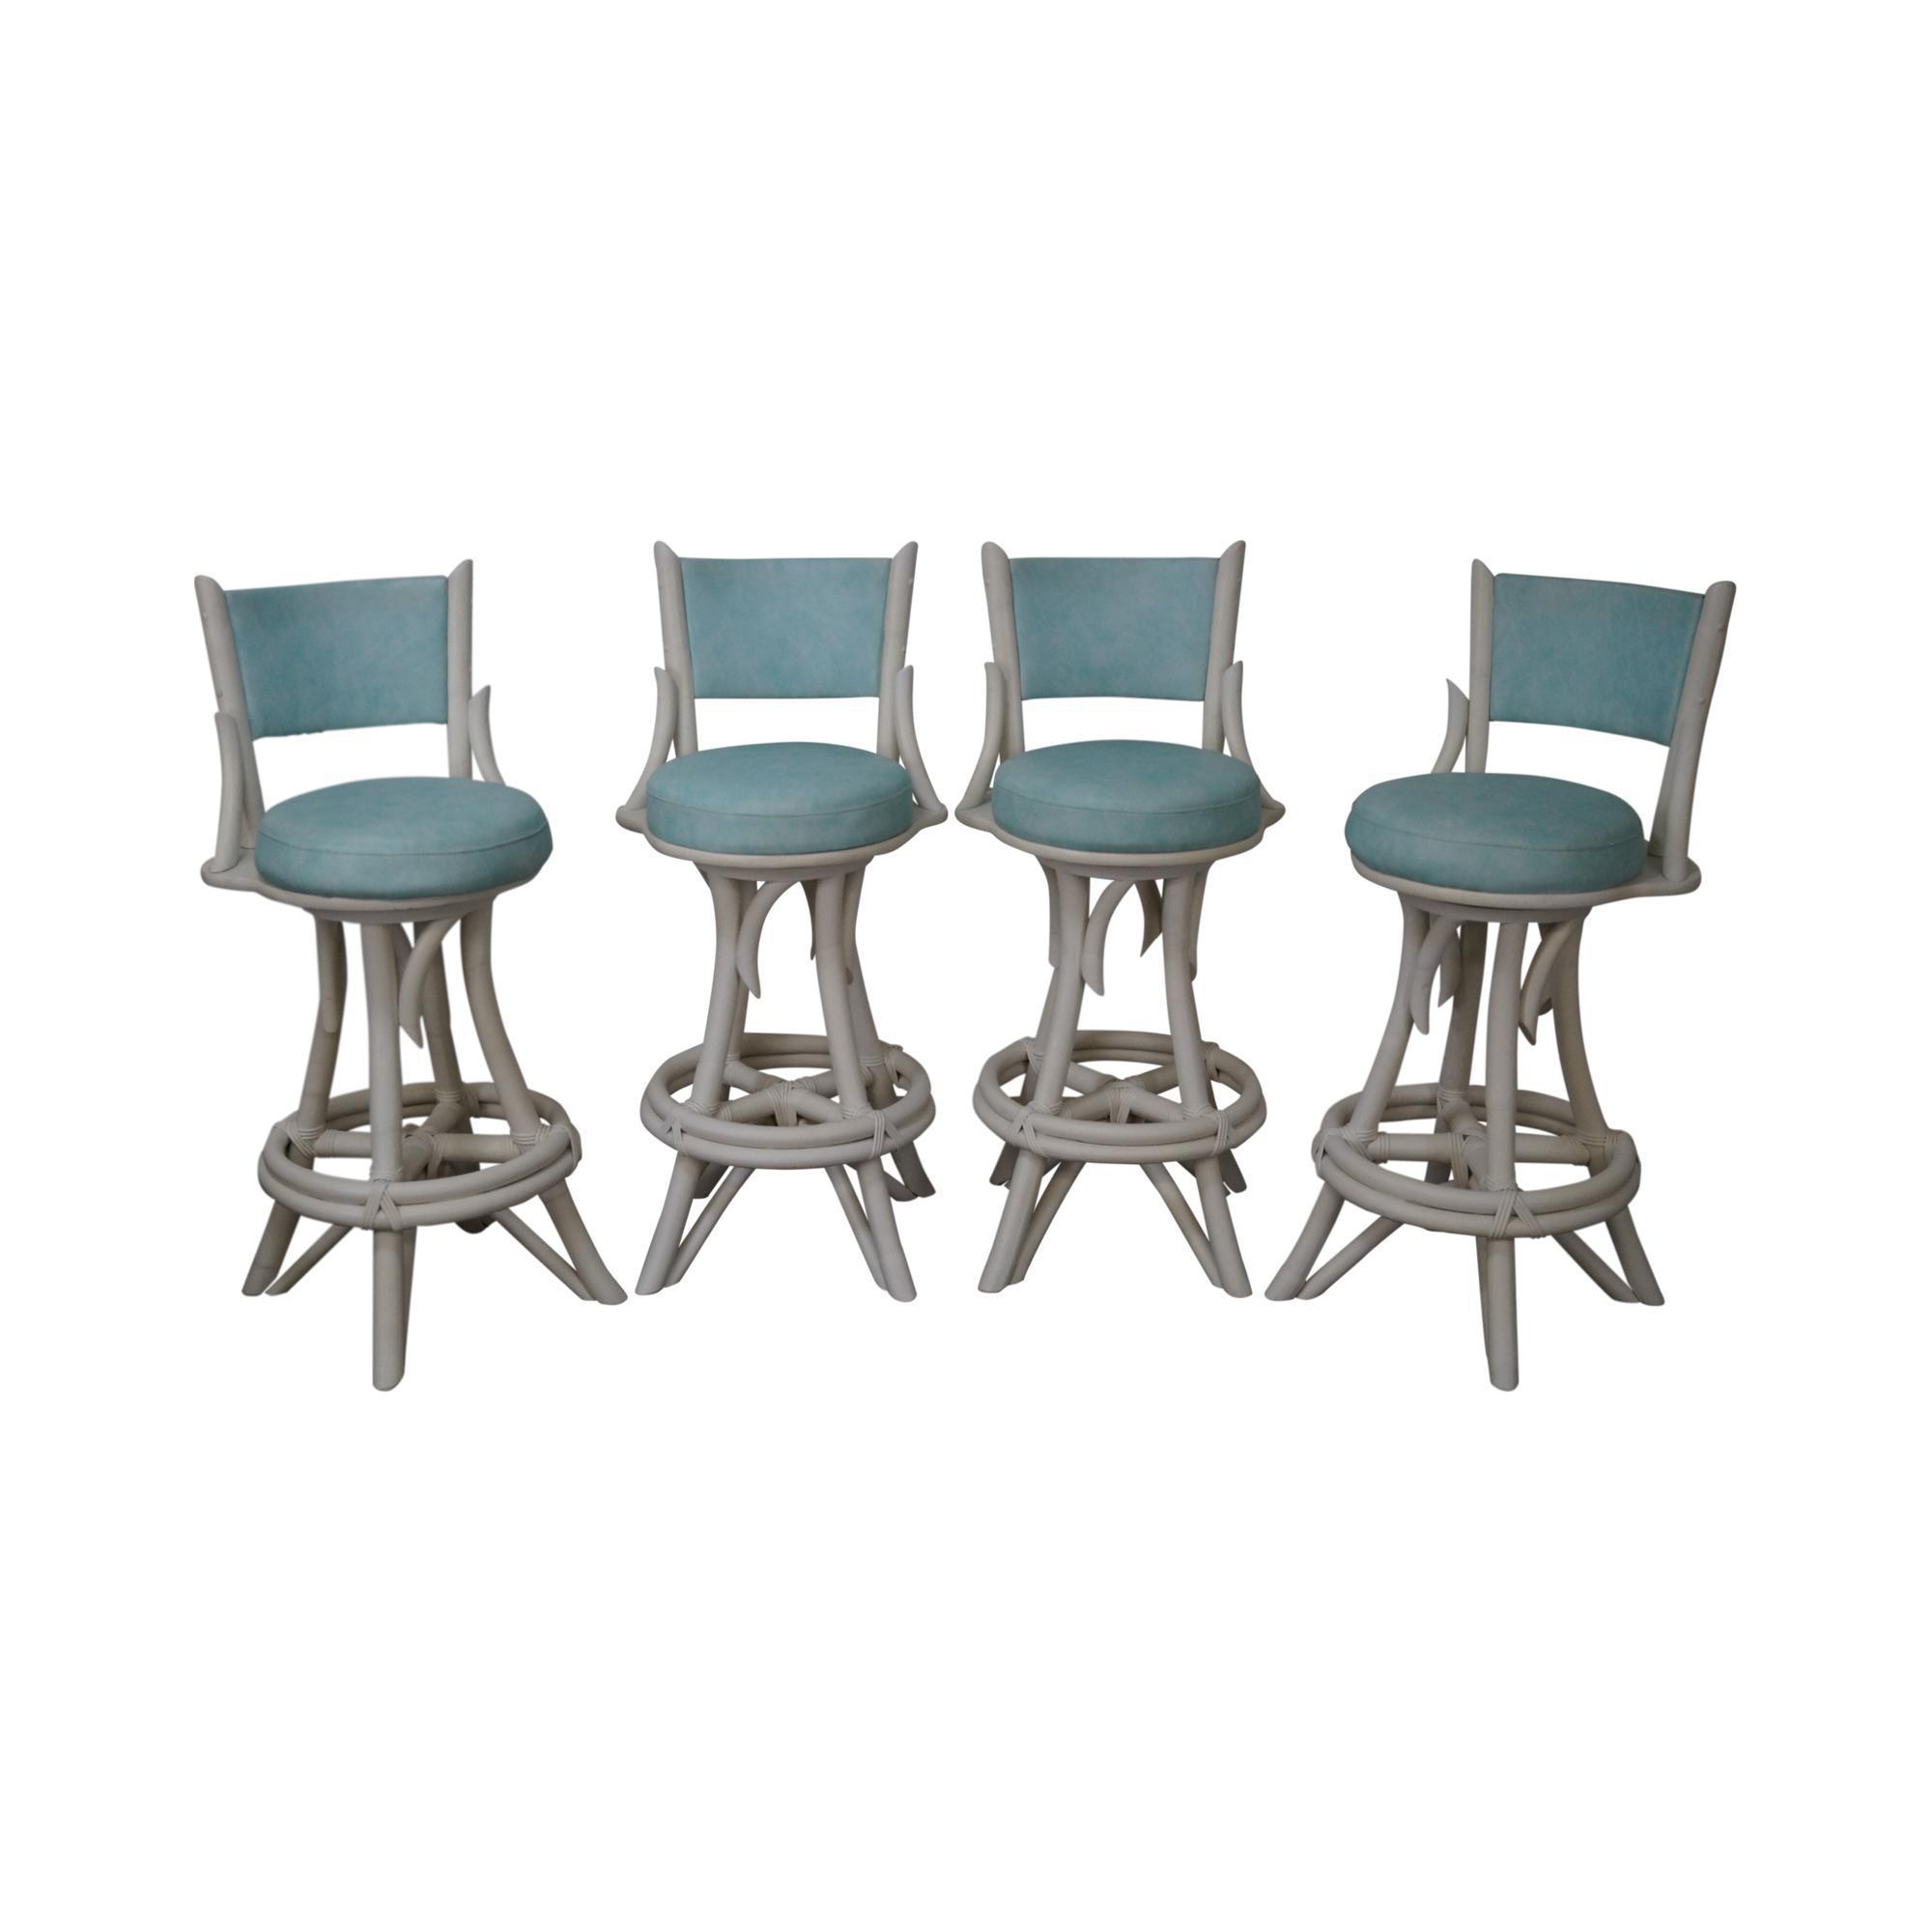 midcentury modern white painted bamboo swivel bar stools set of 4